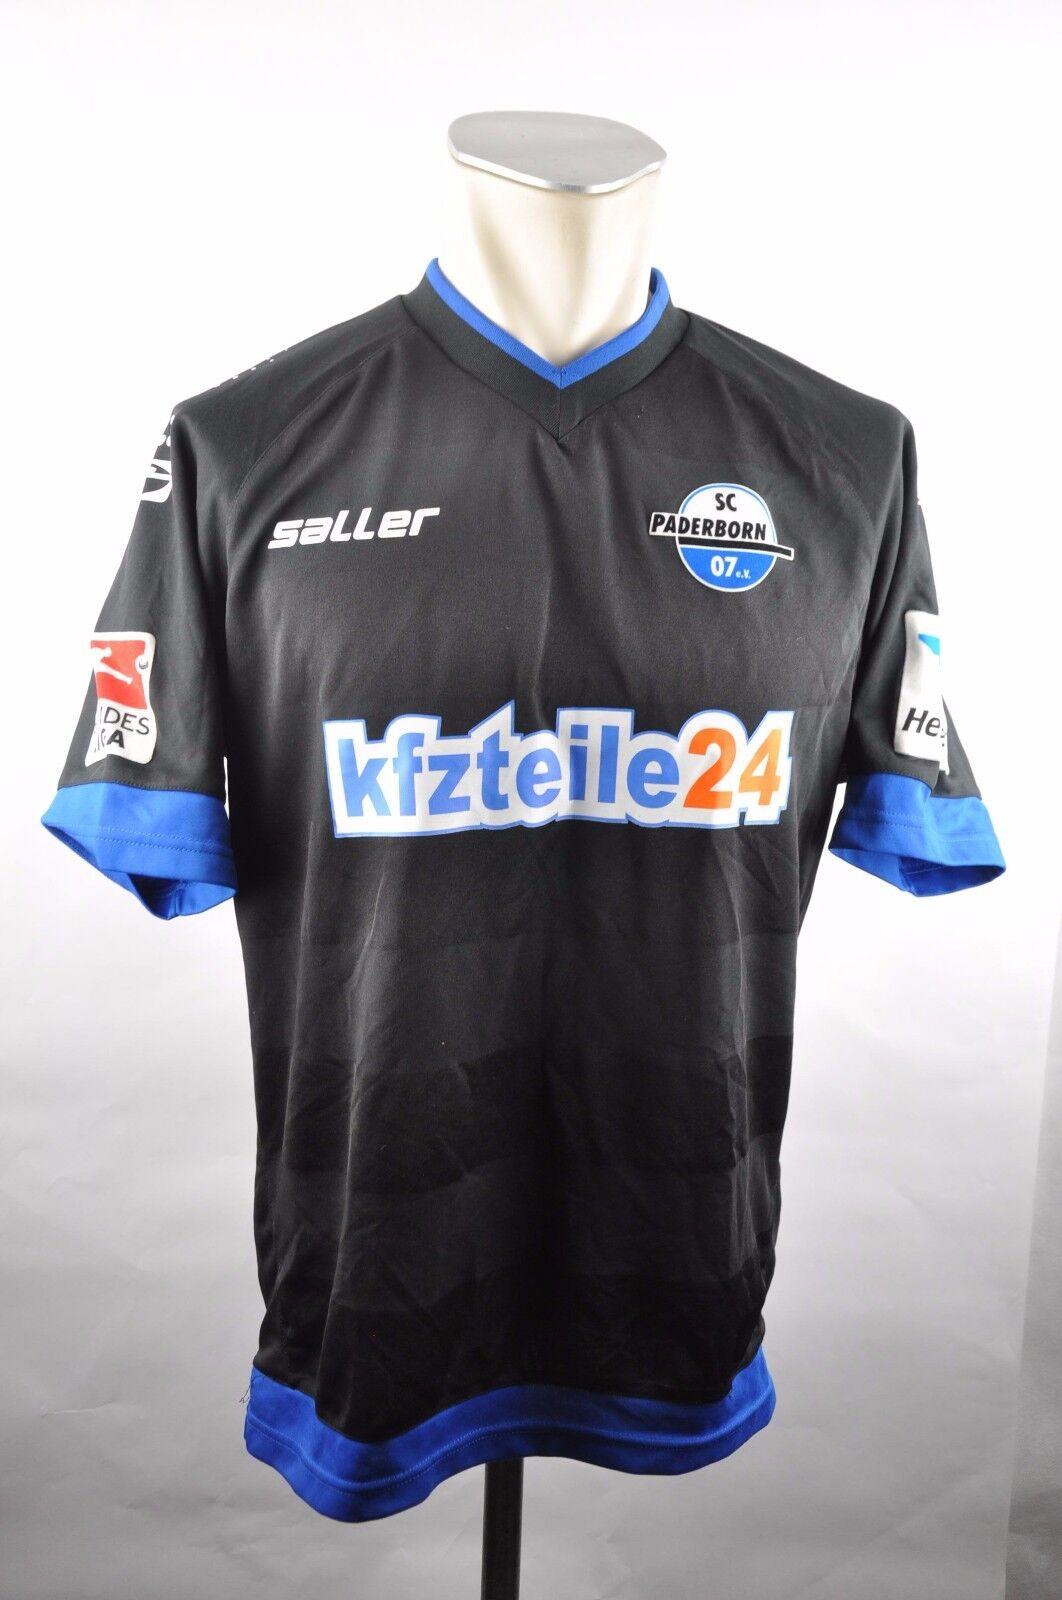 SC SC SC Pasderborn Trikot Gr. M Saller 2013-2014  27 Pepic Home Bundesliga SCP 07 c1f1f0